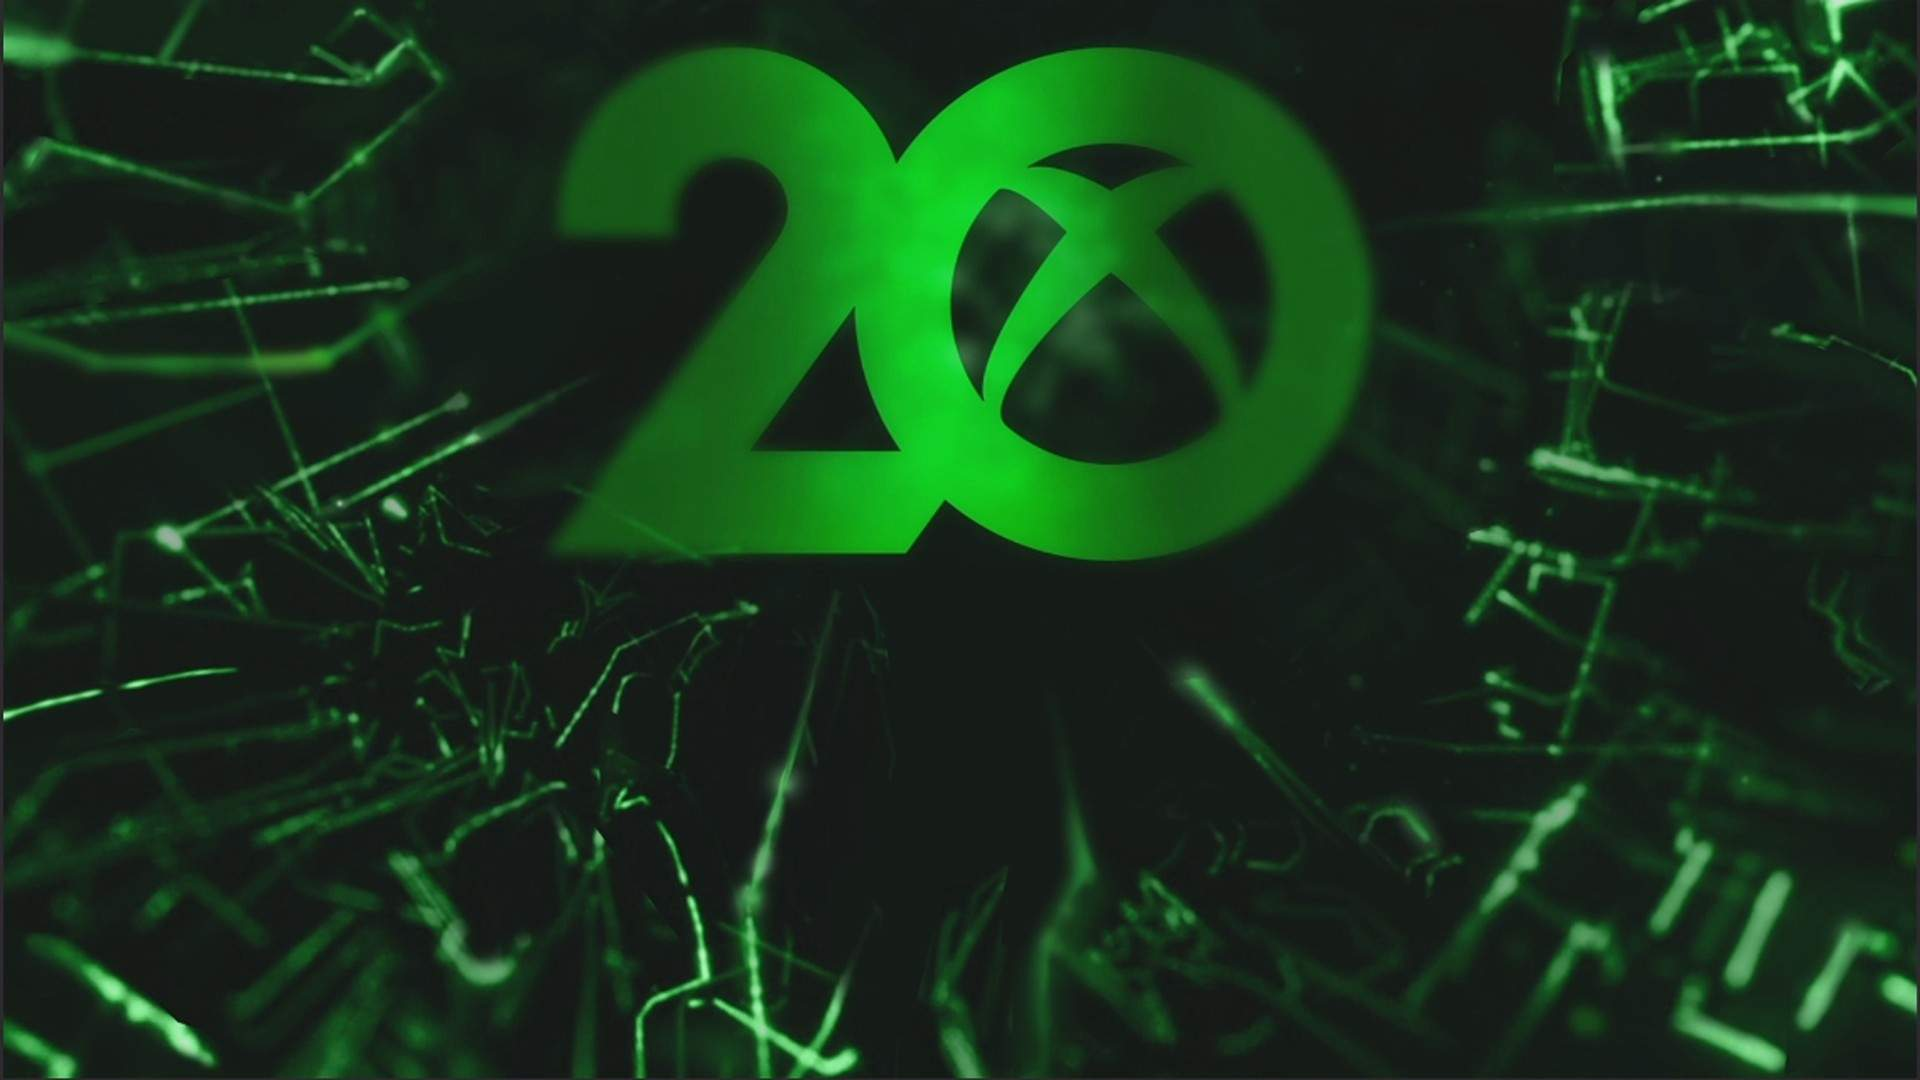 Xbox celebra su 20 aniversario con este espectacular mando